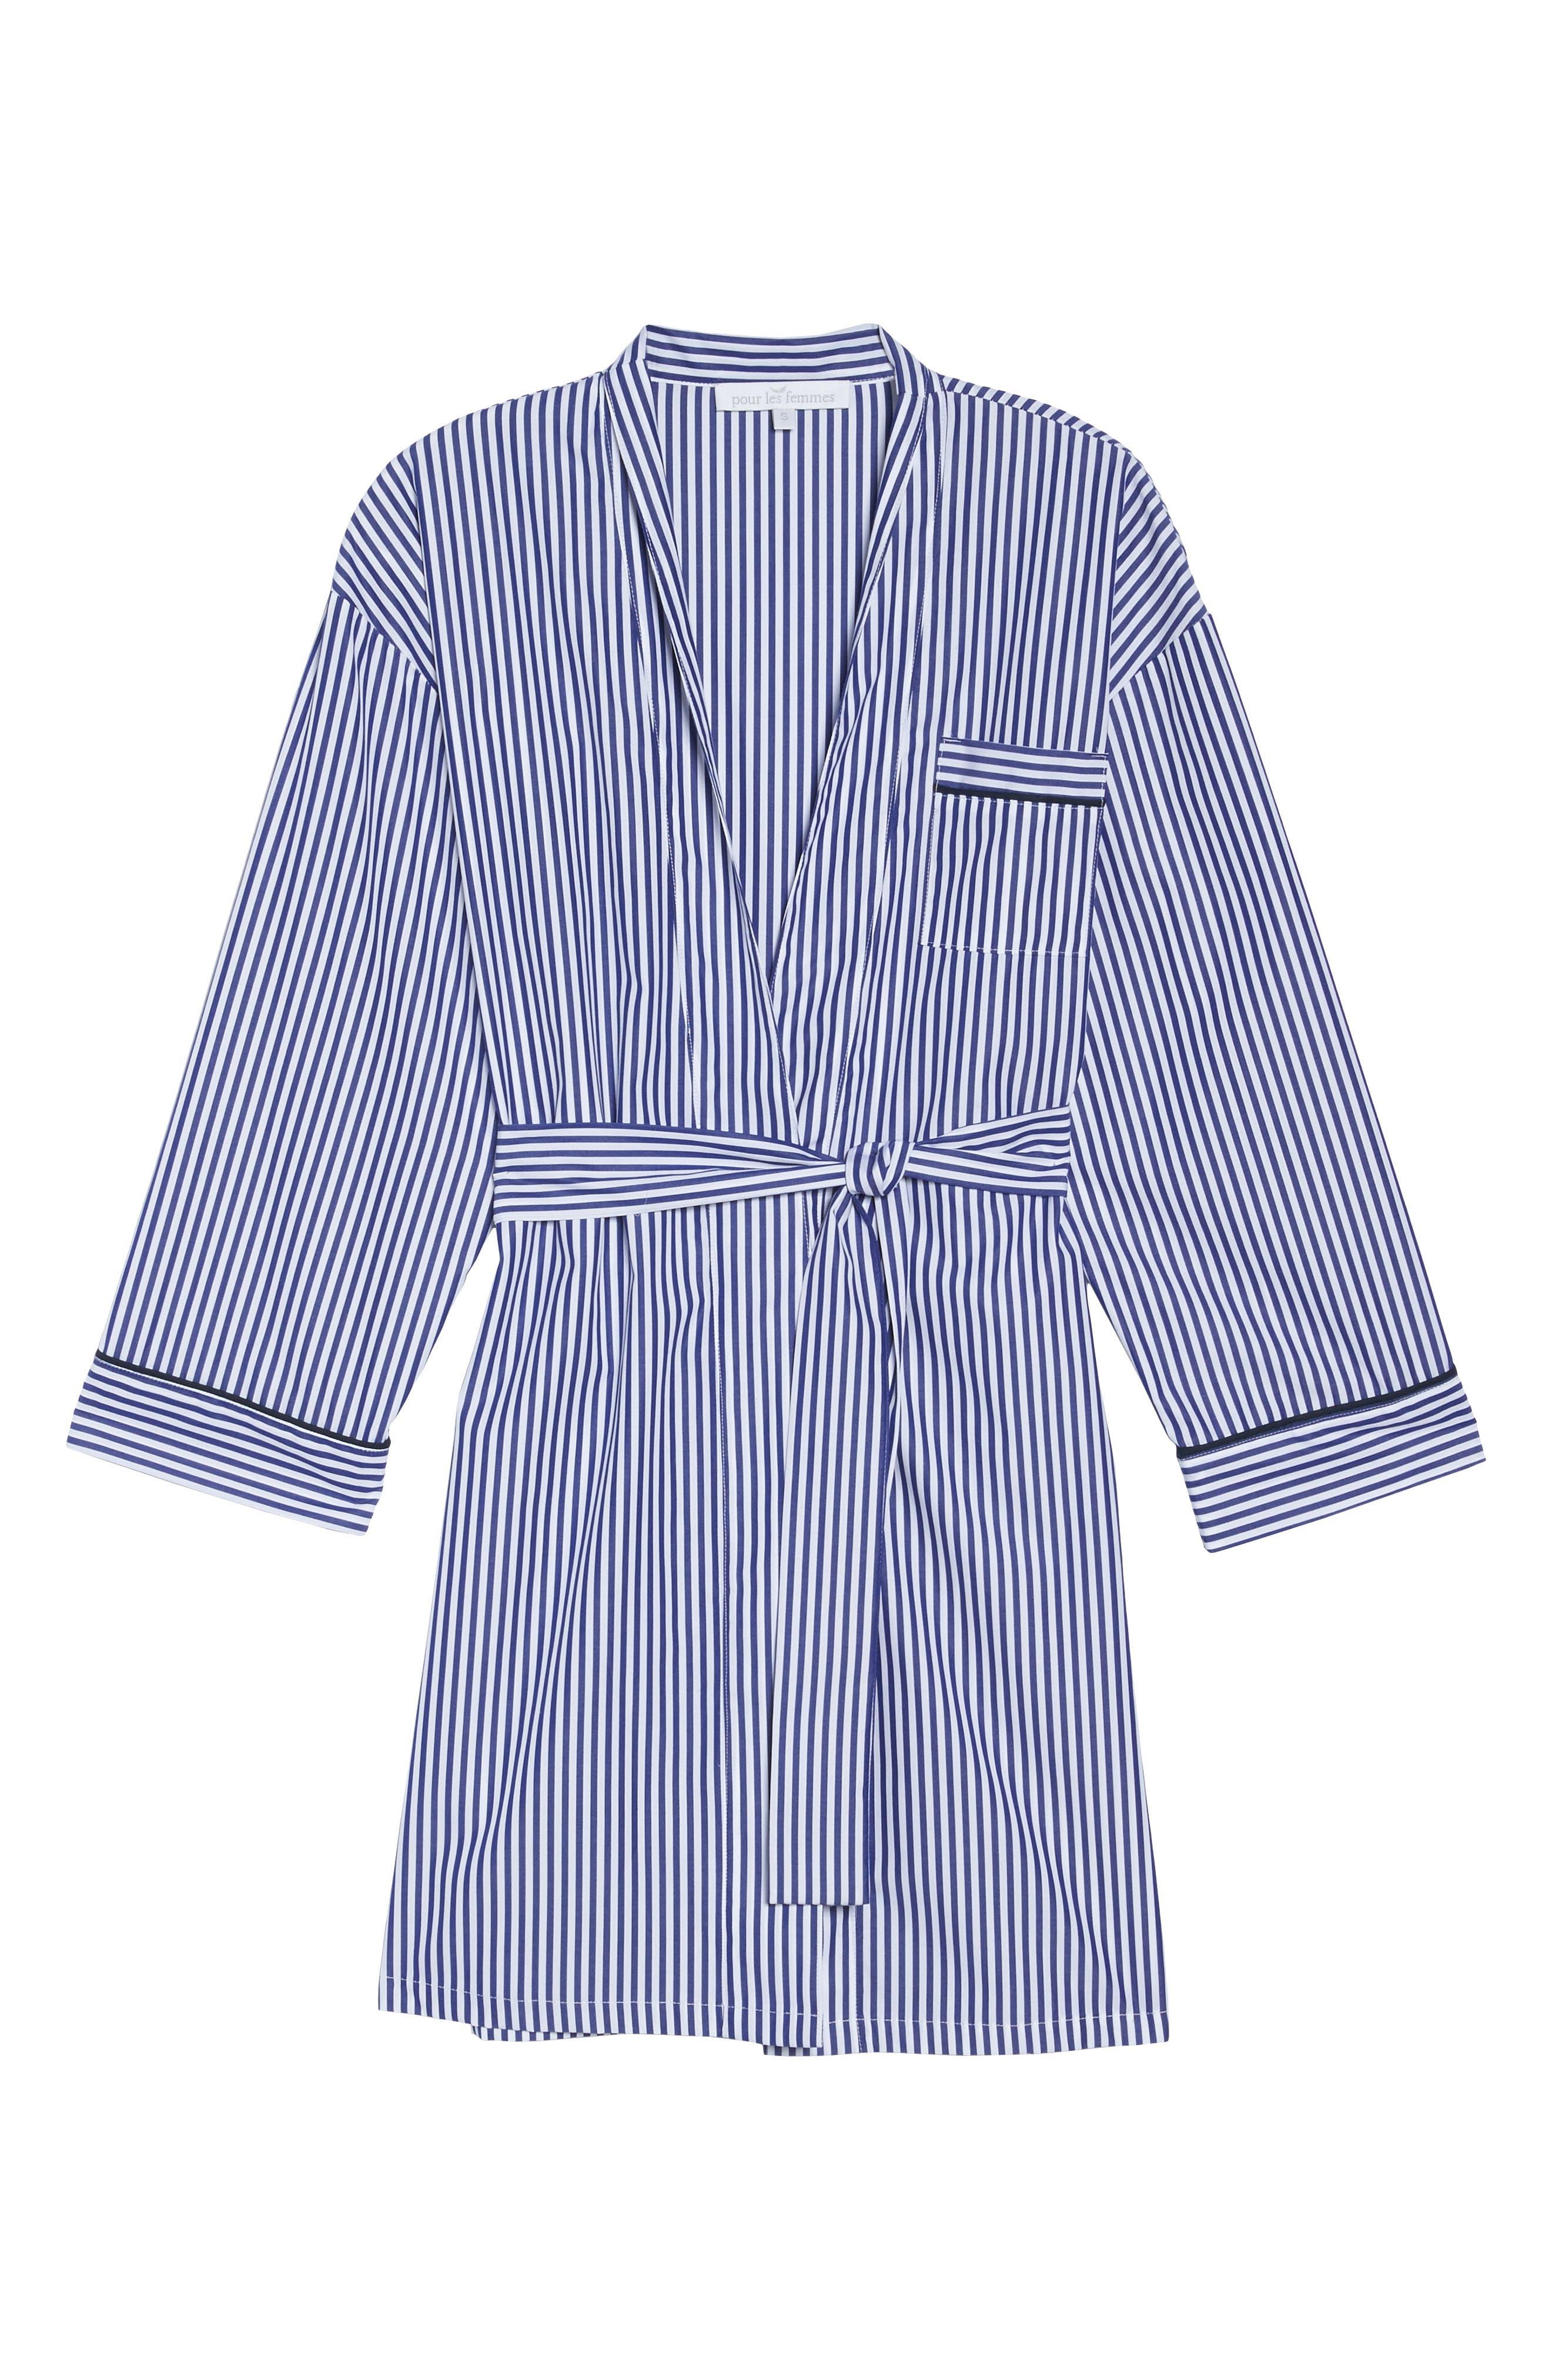 Stripe Robe,                             Alternate thumbnail 6, color,                             400